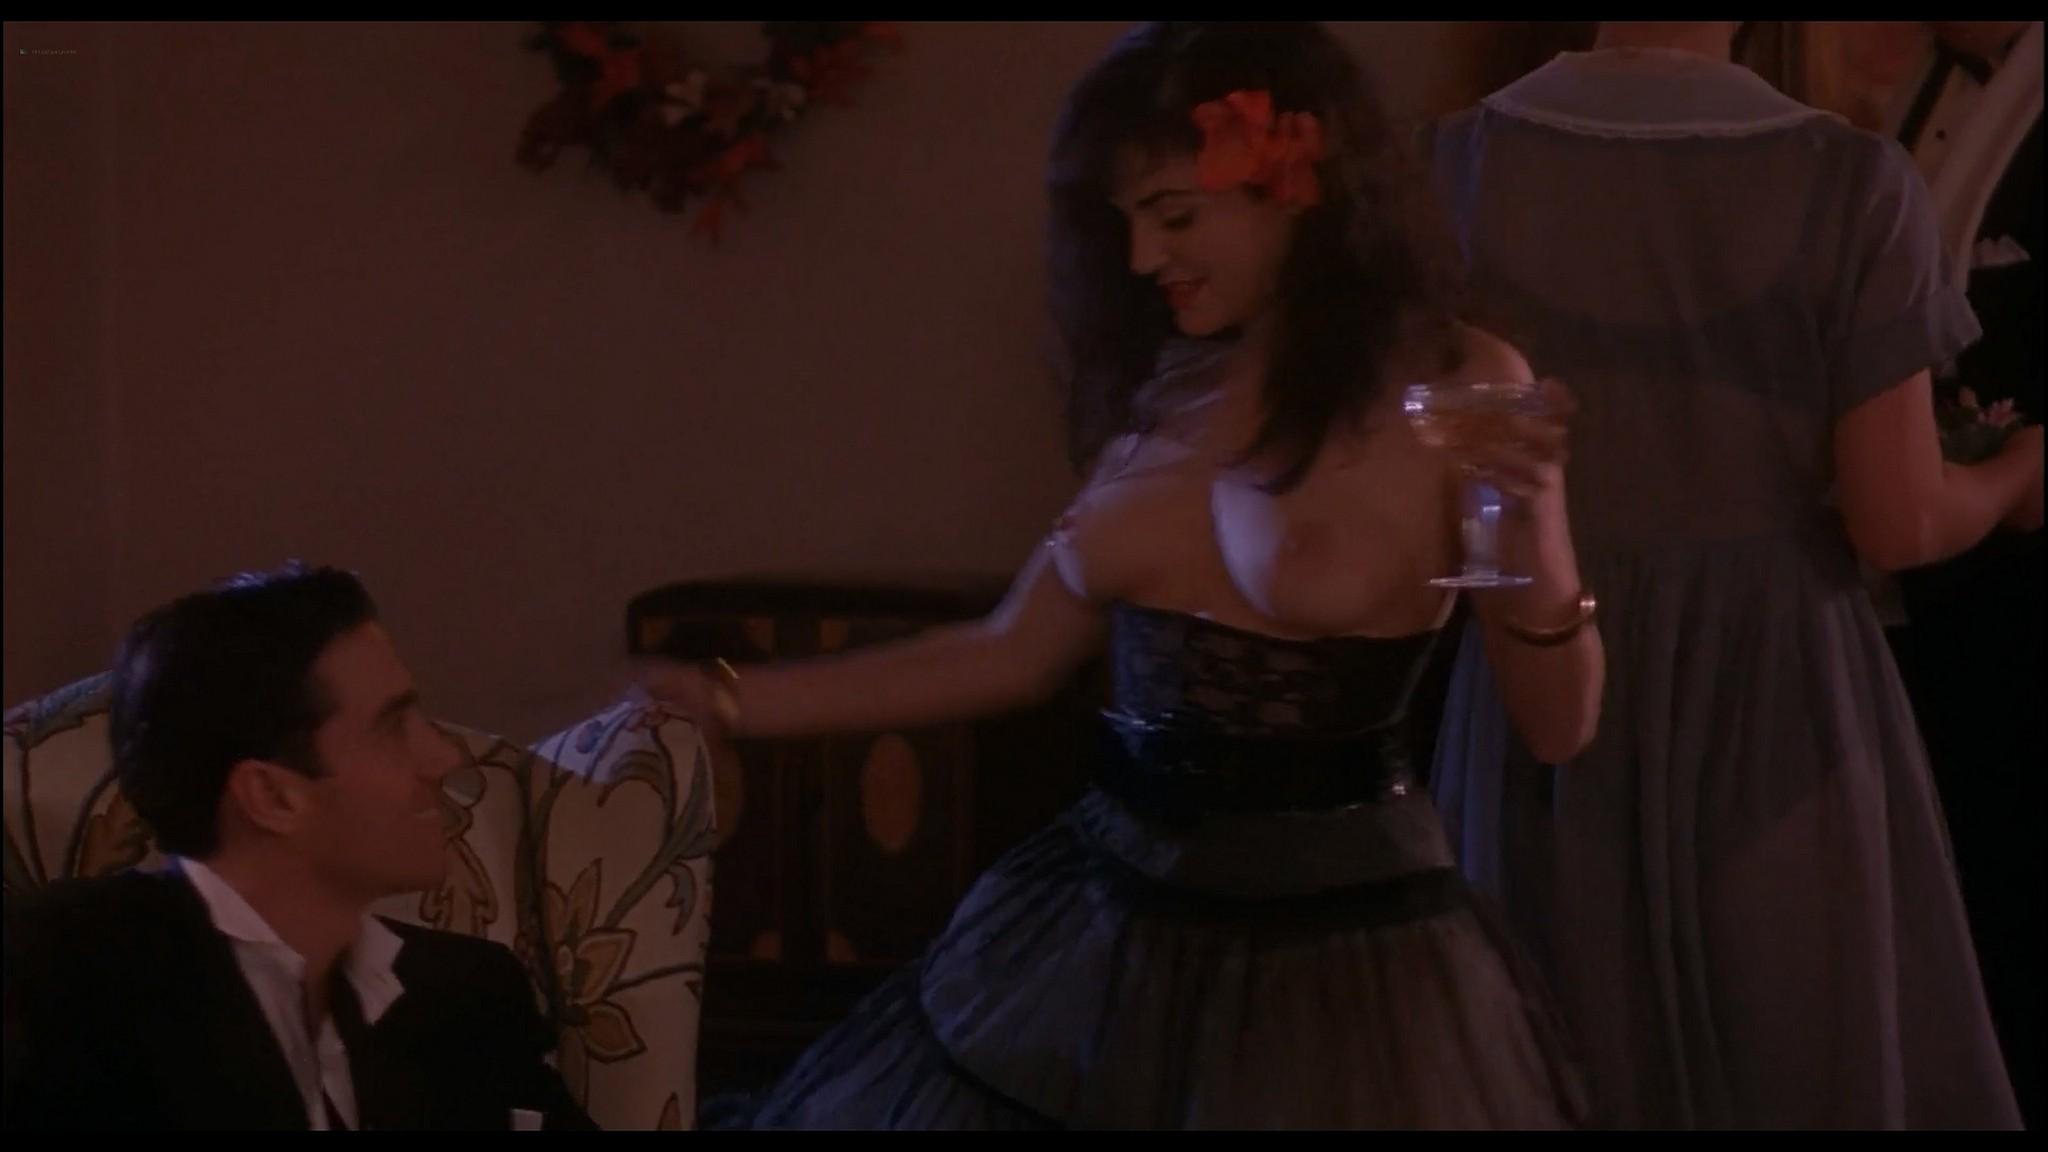 Nina Siemaszko nude sex Lydie Denier Gloria Reuben and others nude sex Wild Orchid 2 1992 1080p BluRay 10